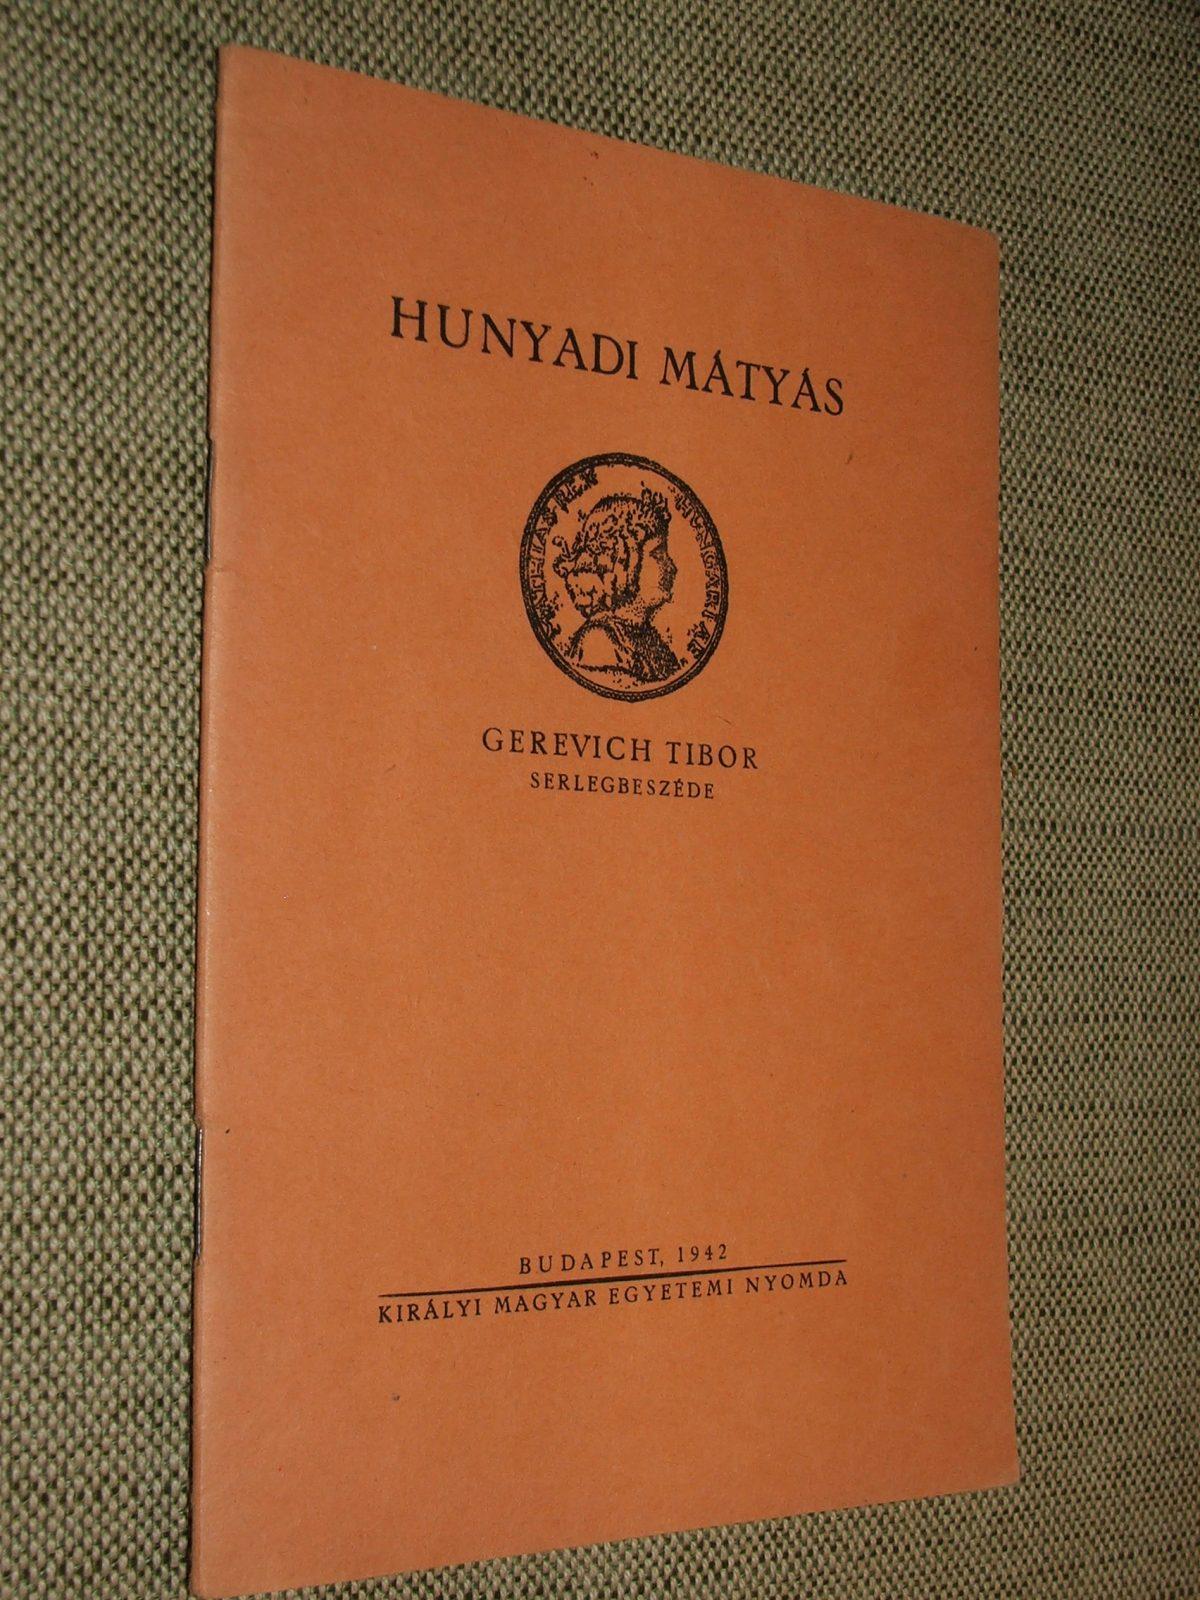 GEREVICH Tibor: Hunyadi Mátyás